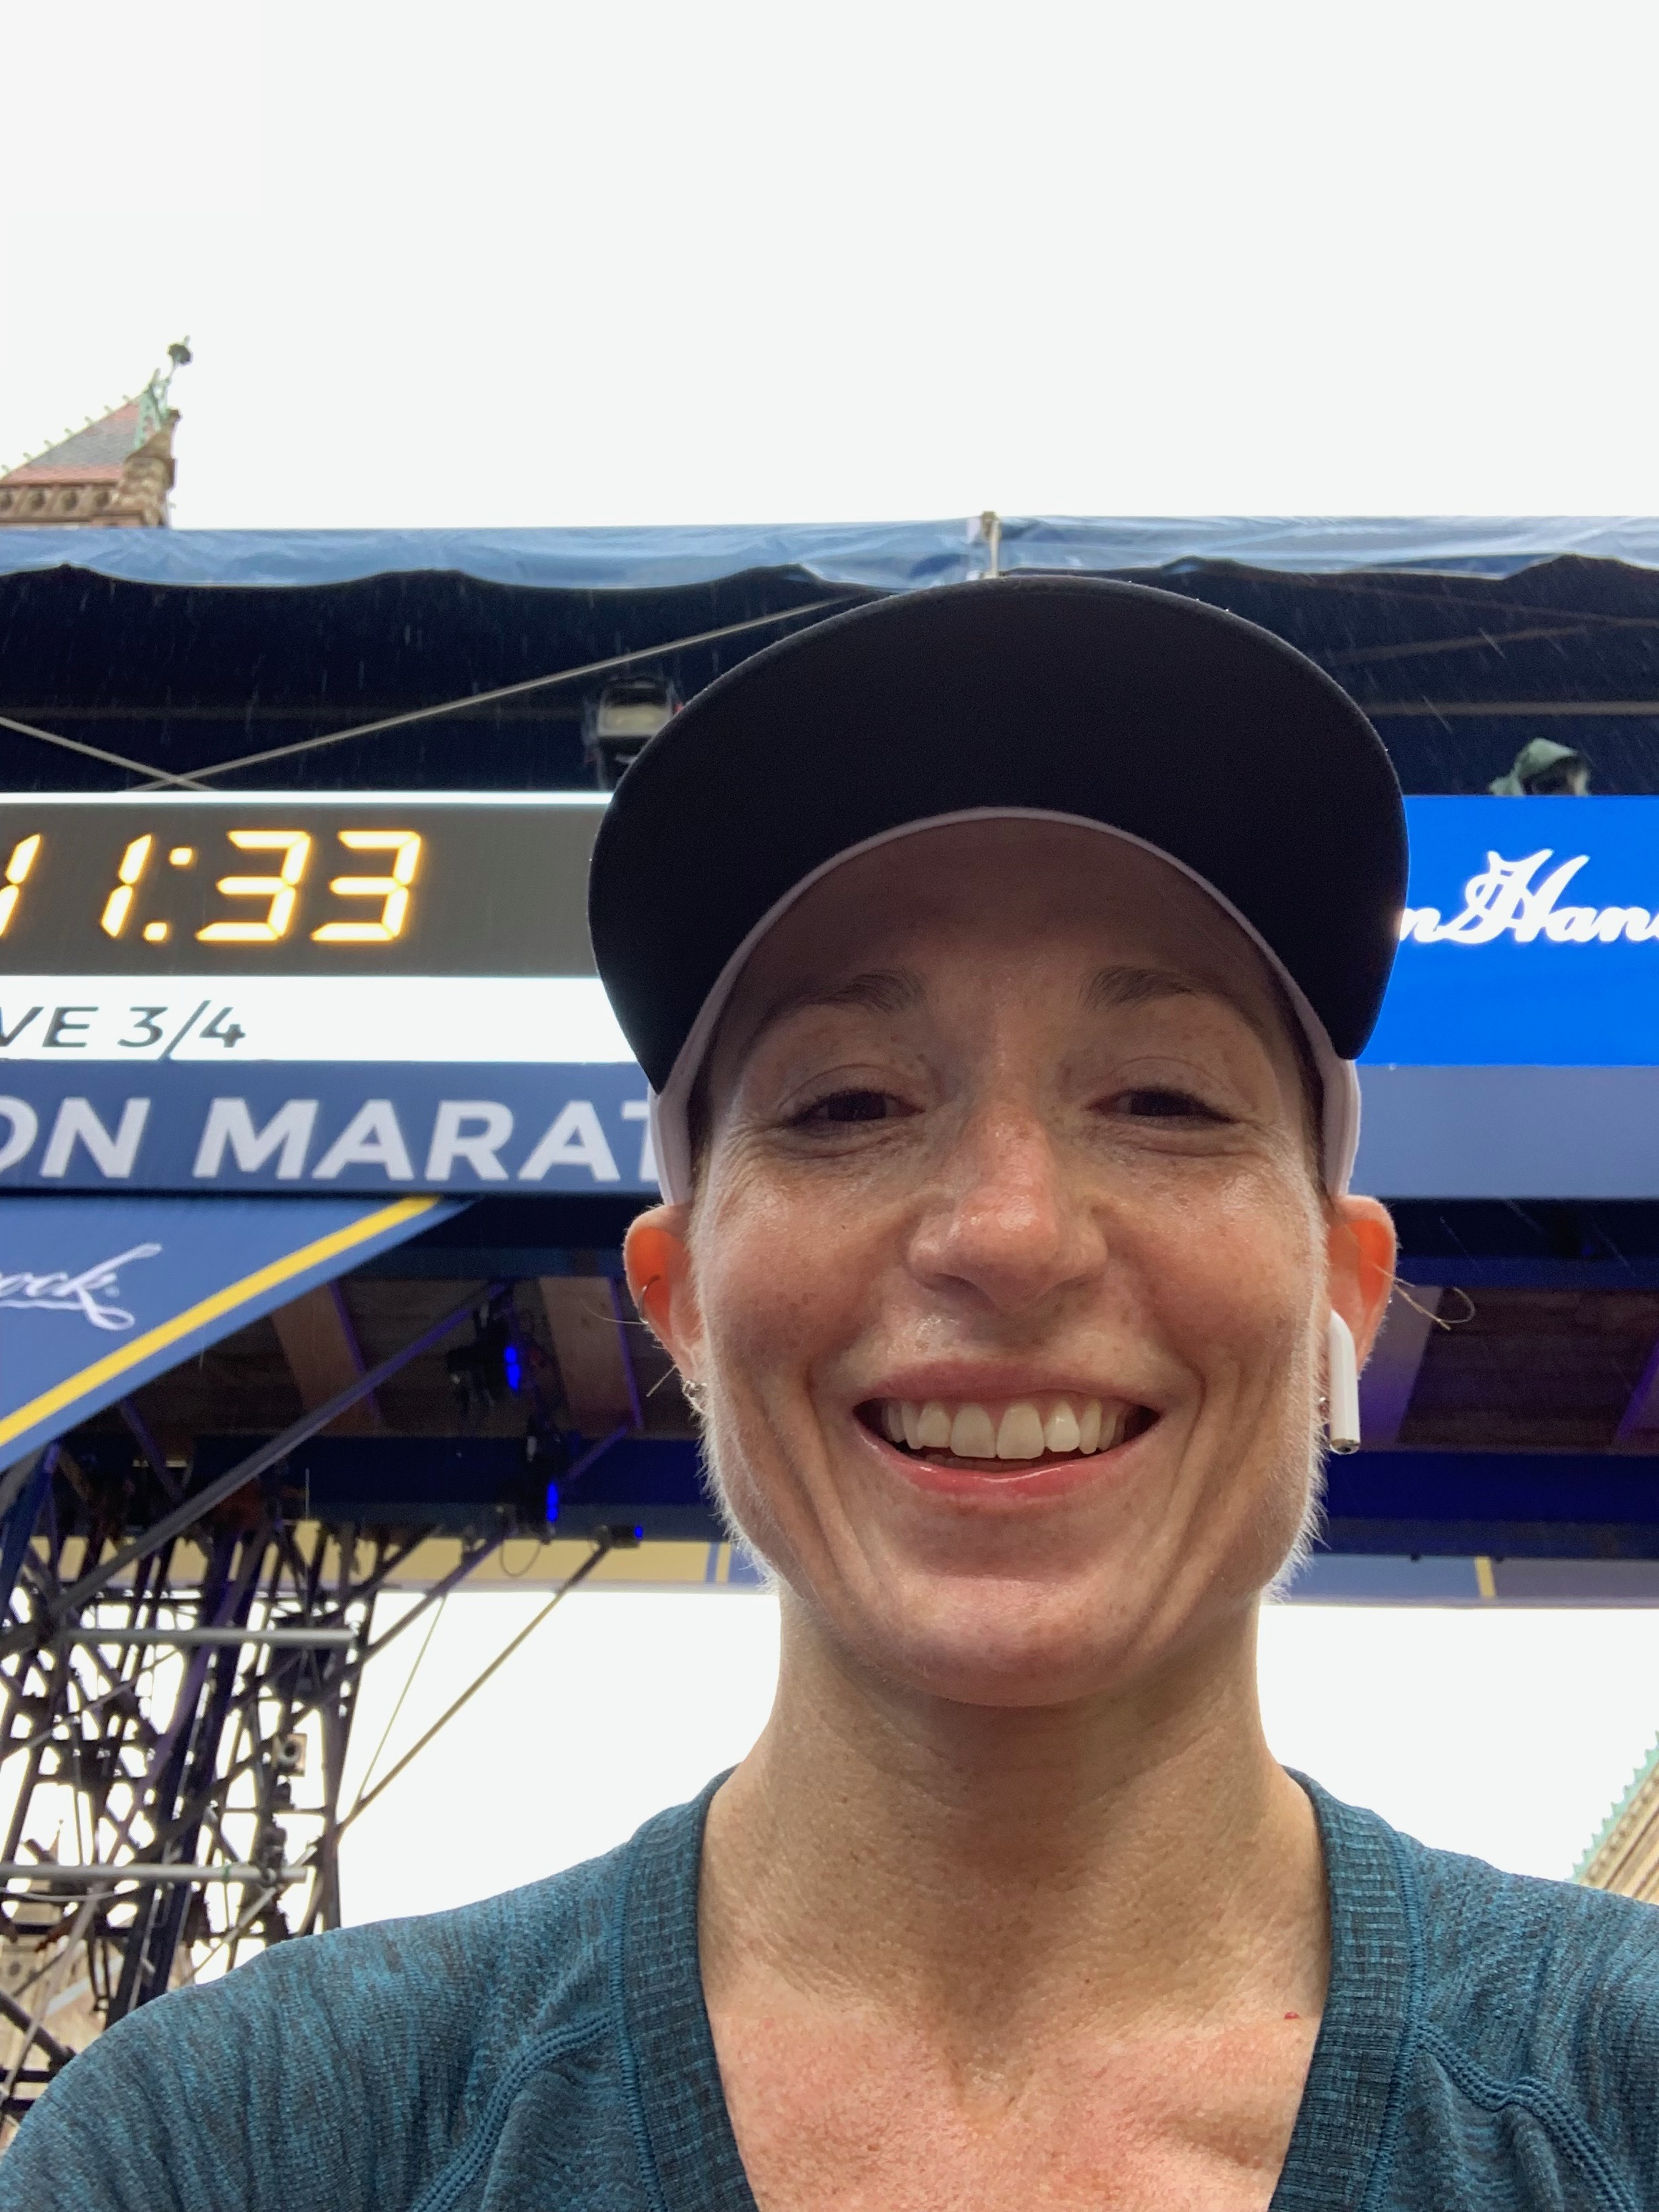 Finish line selfie at the Boston Marathon.